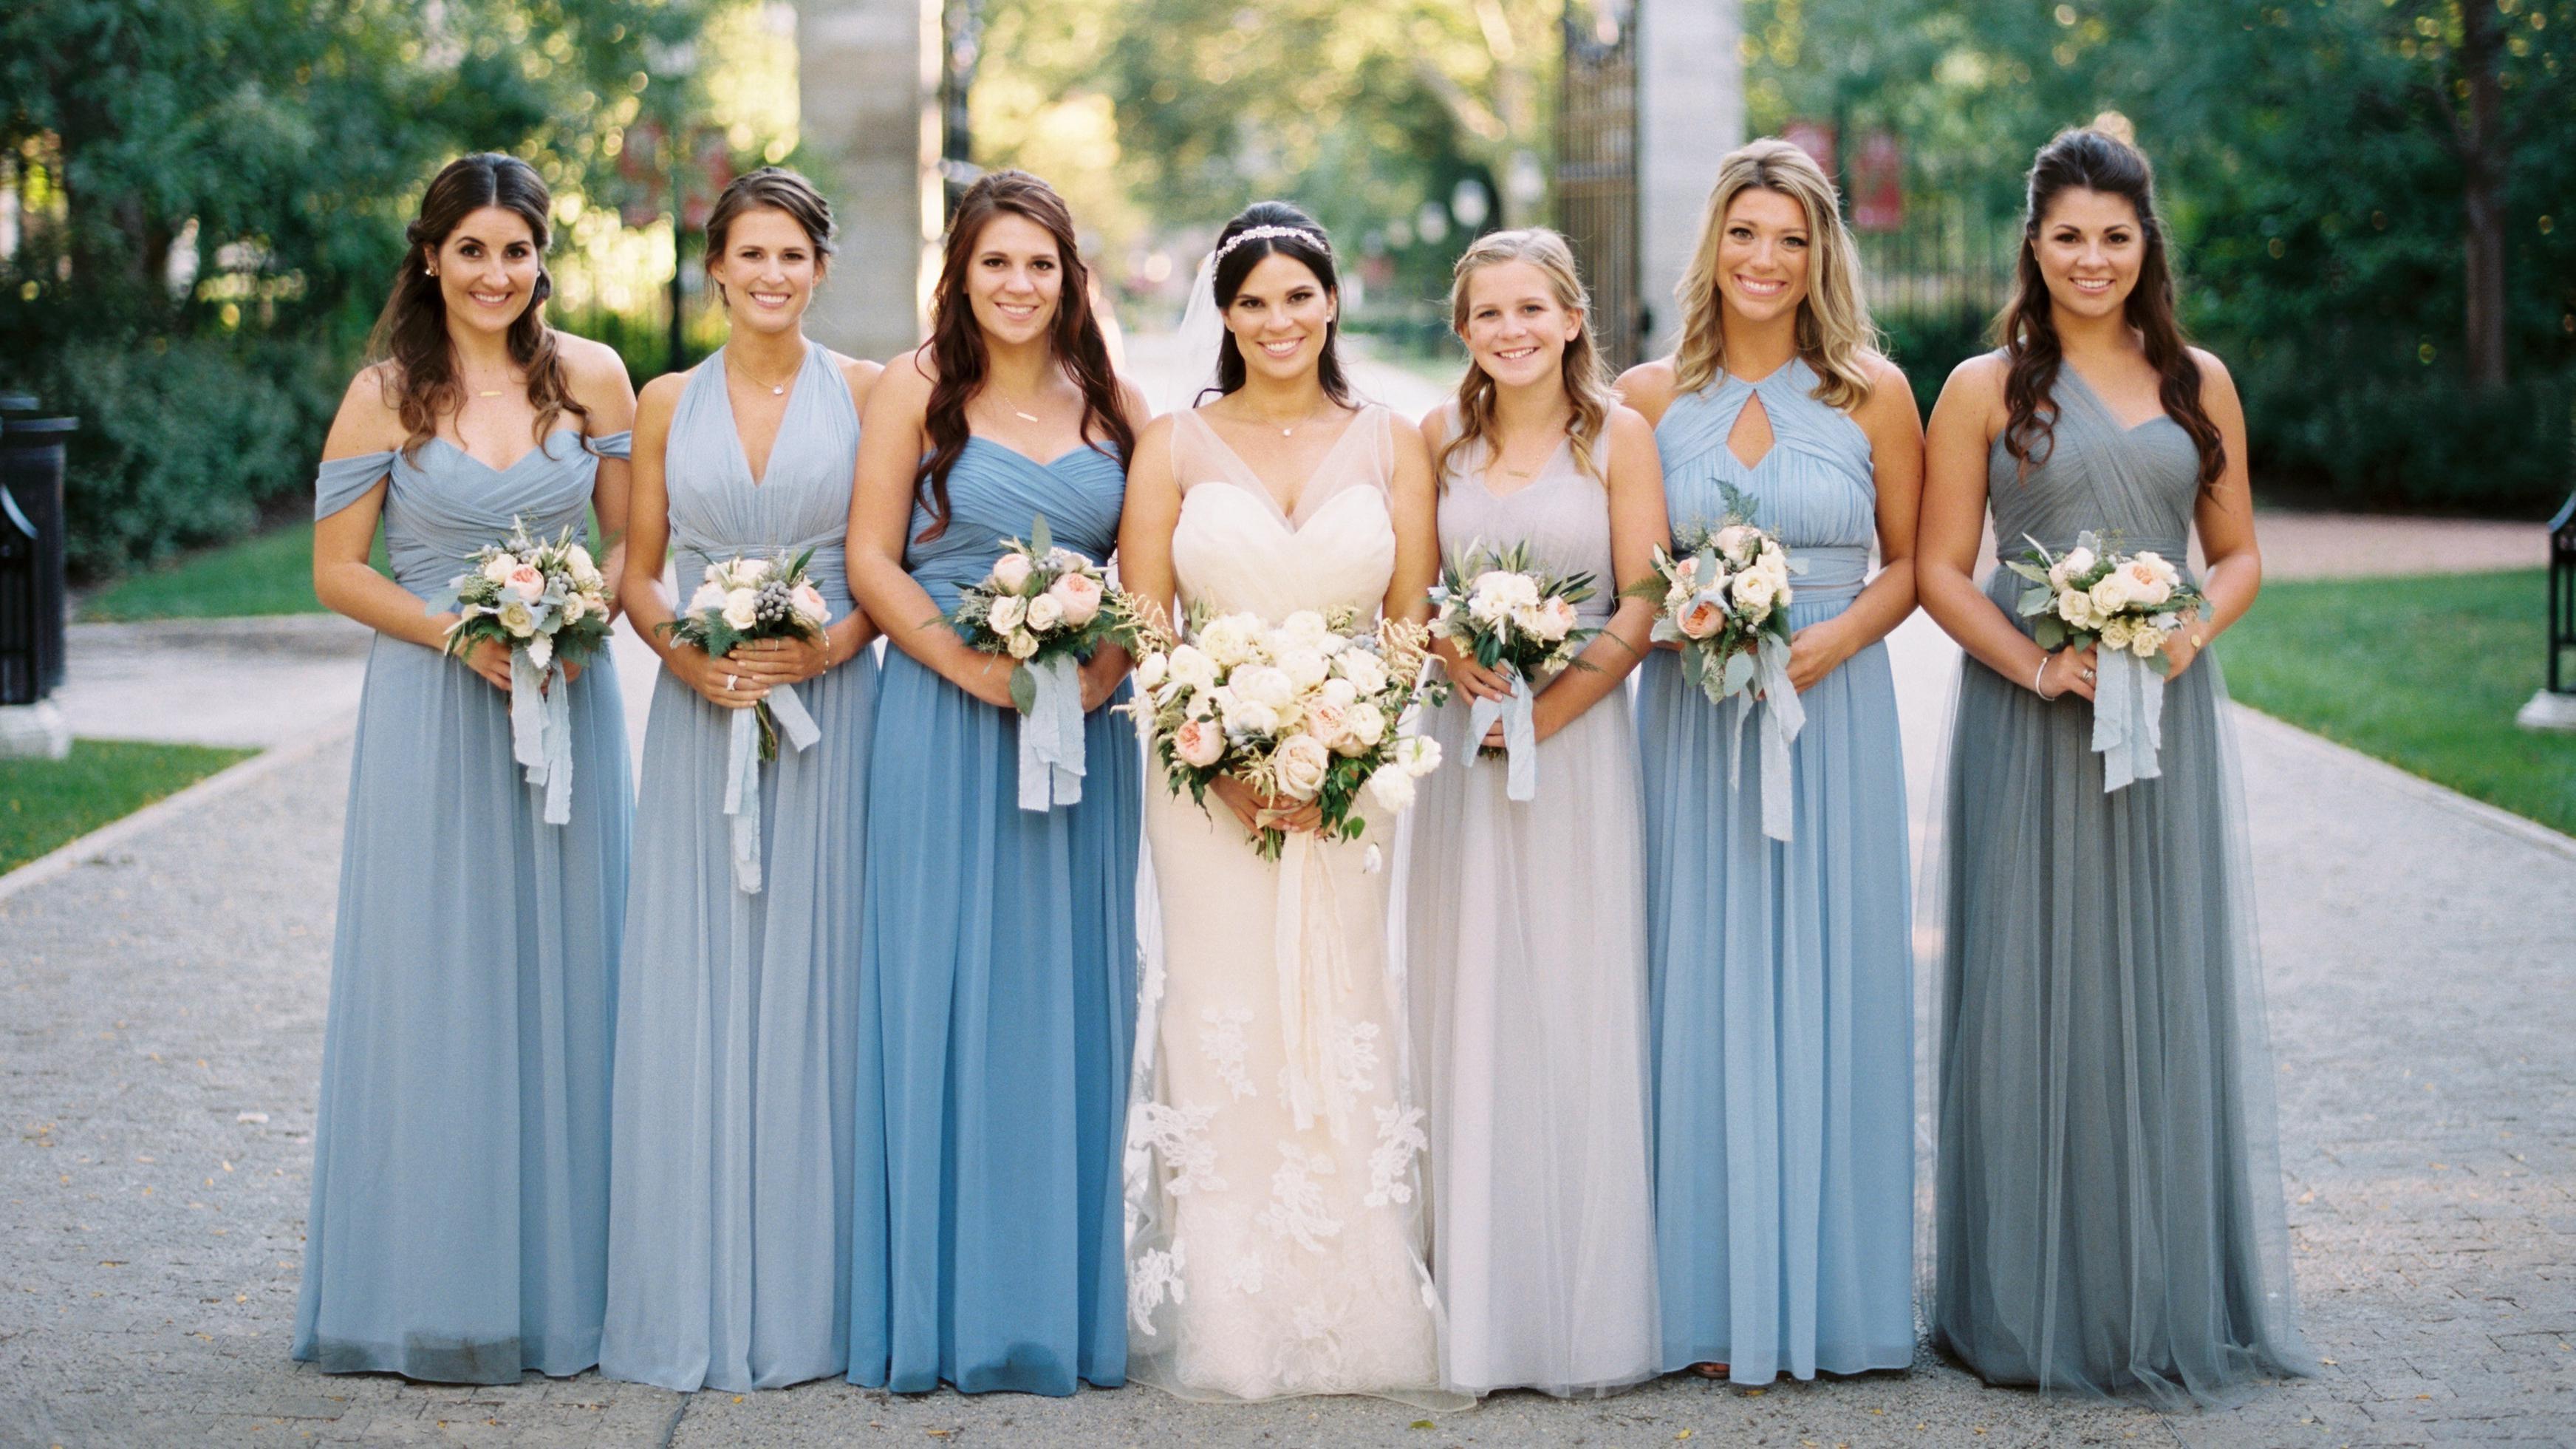 Burgundy Bridesmaid Dresses Flavor up Your Wedding Gathering